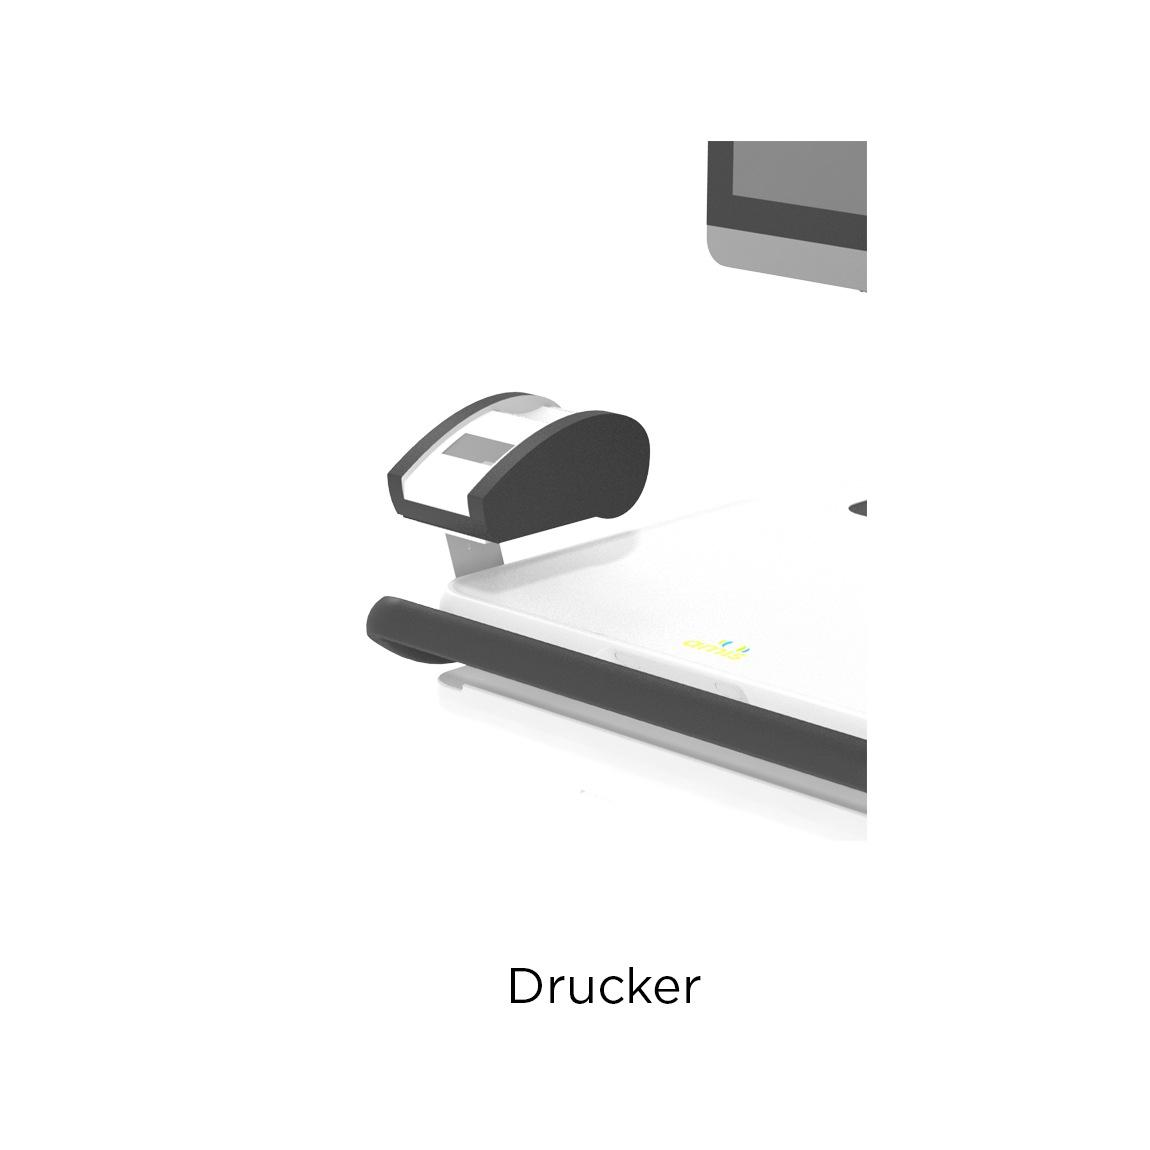 Printer Integration